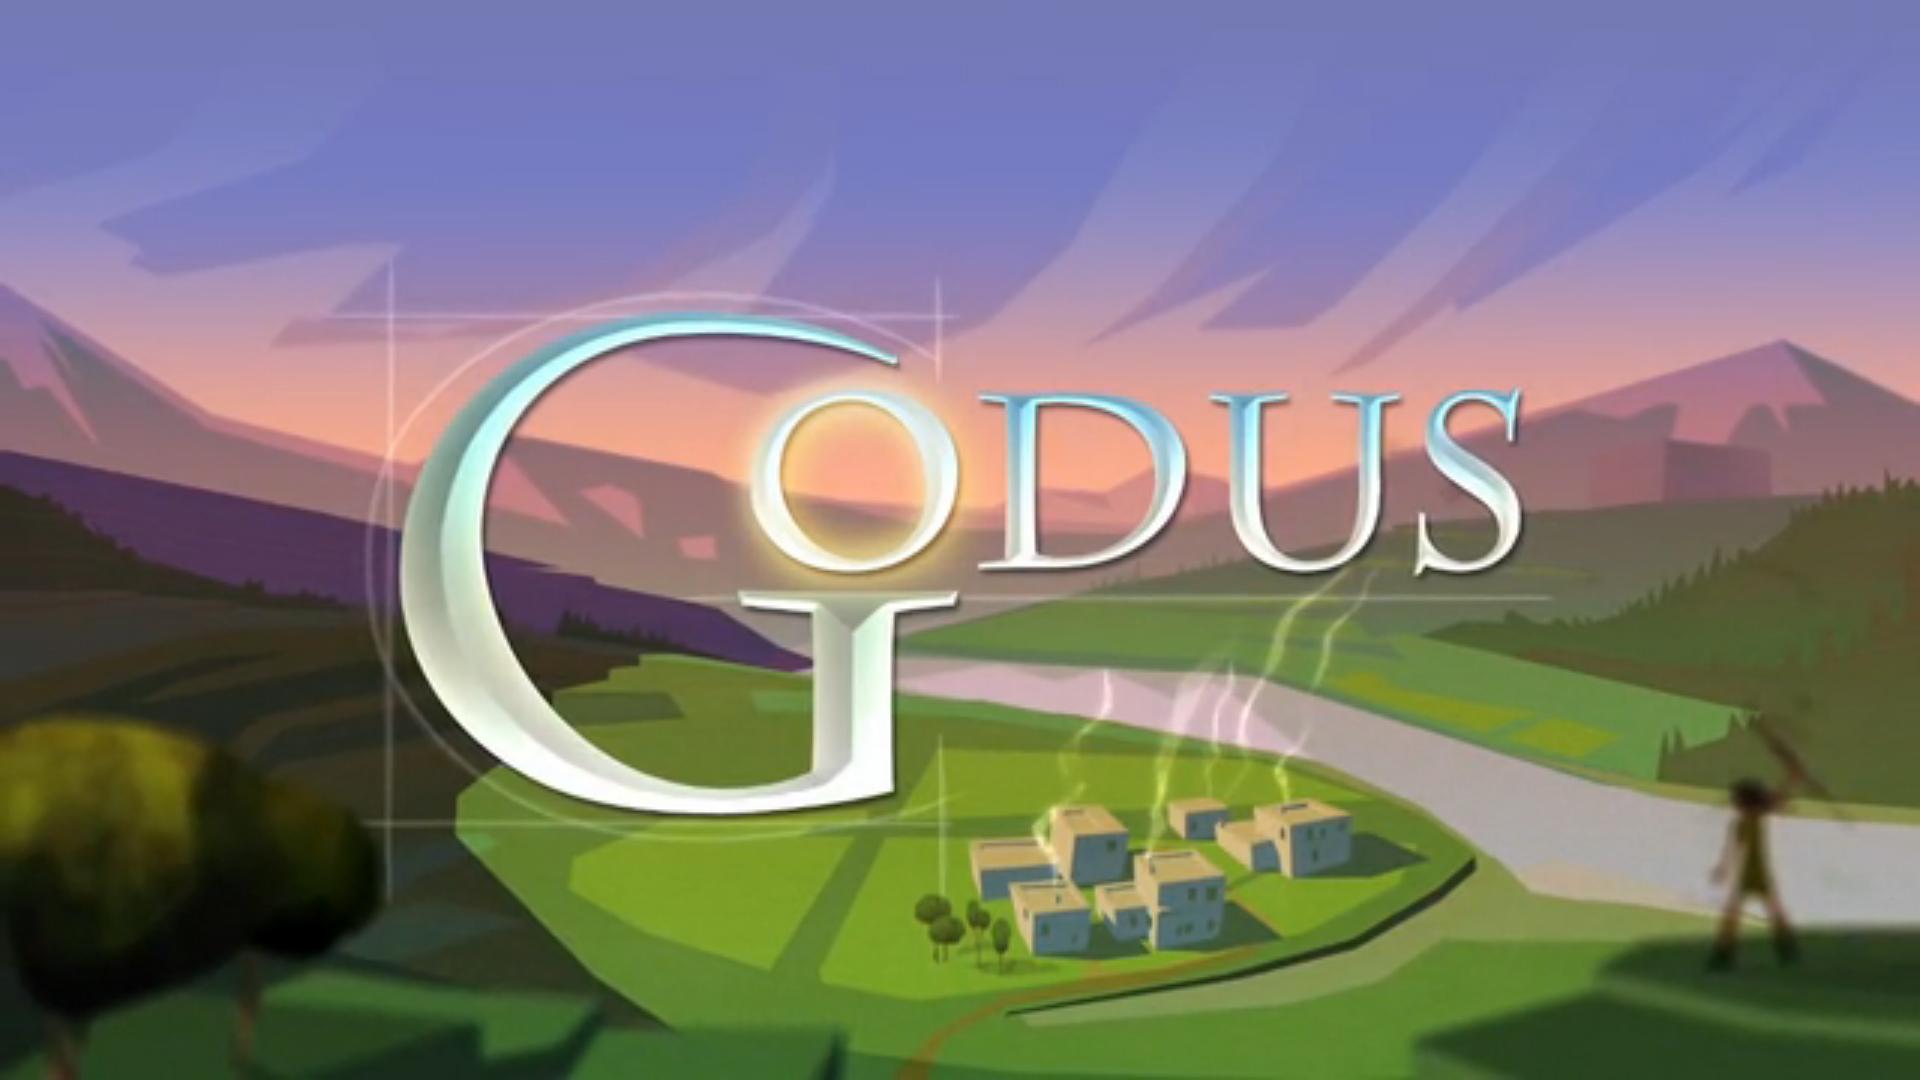 Project-Godus